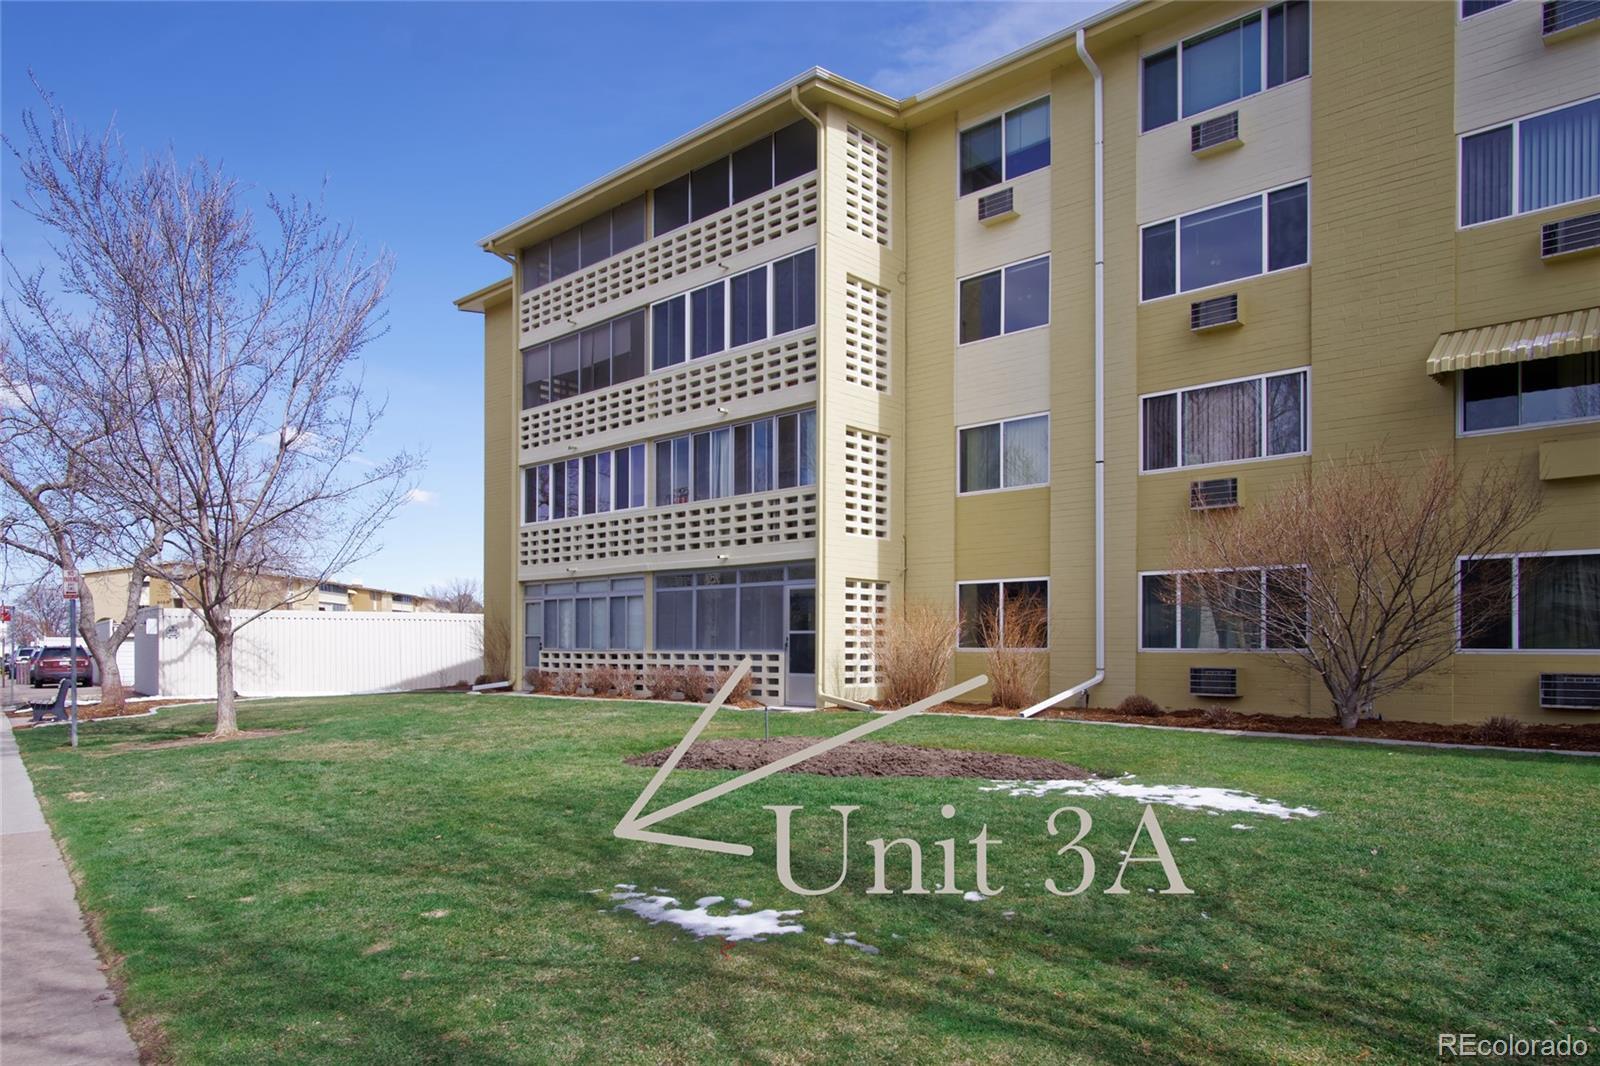 MLS# 3287239 - 1 - 610 S Alton Way #3A, Denver, CO 80247